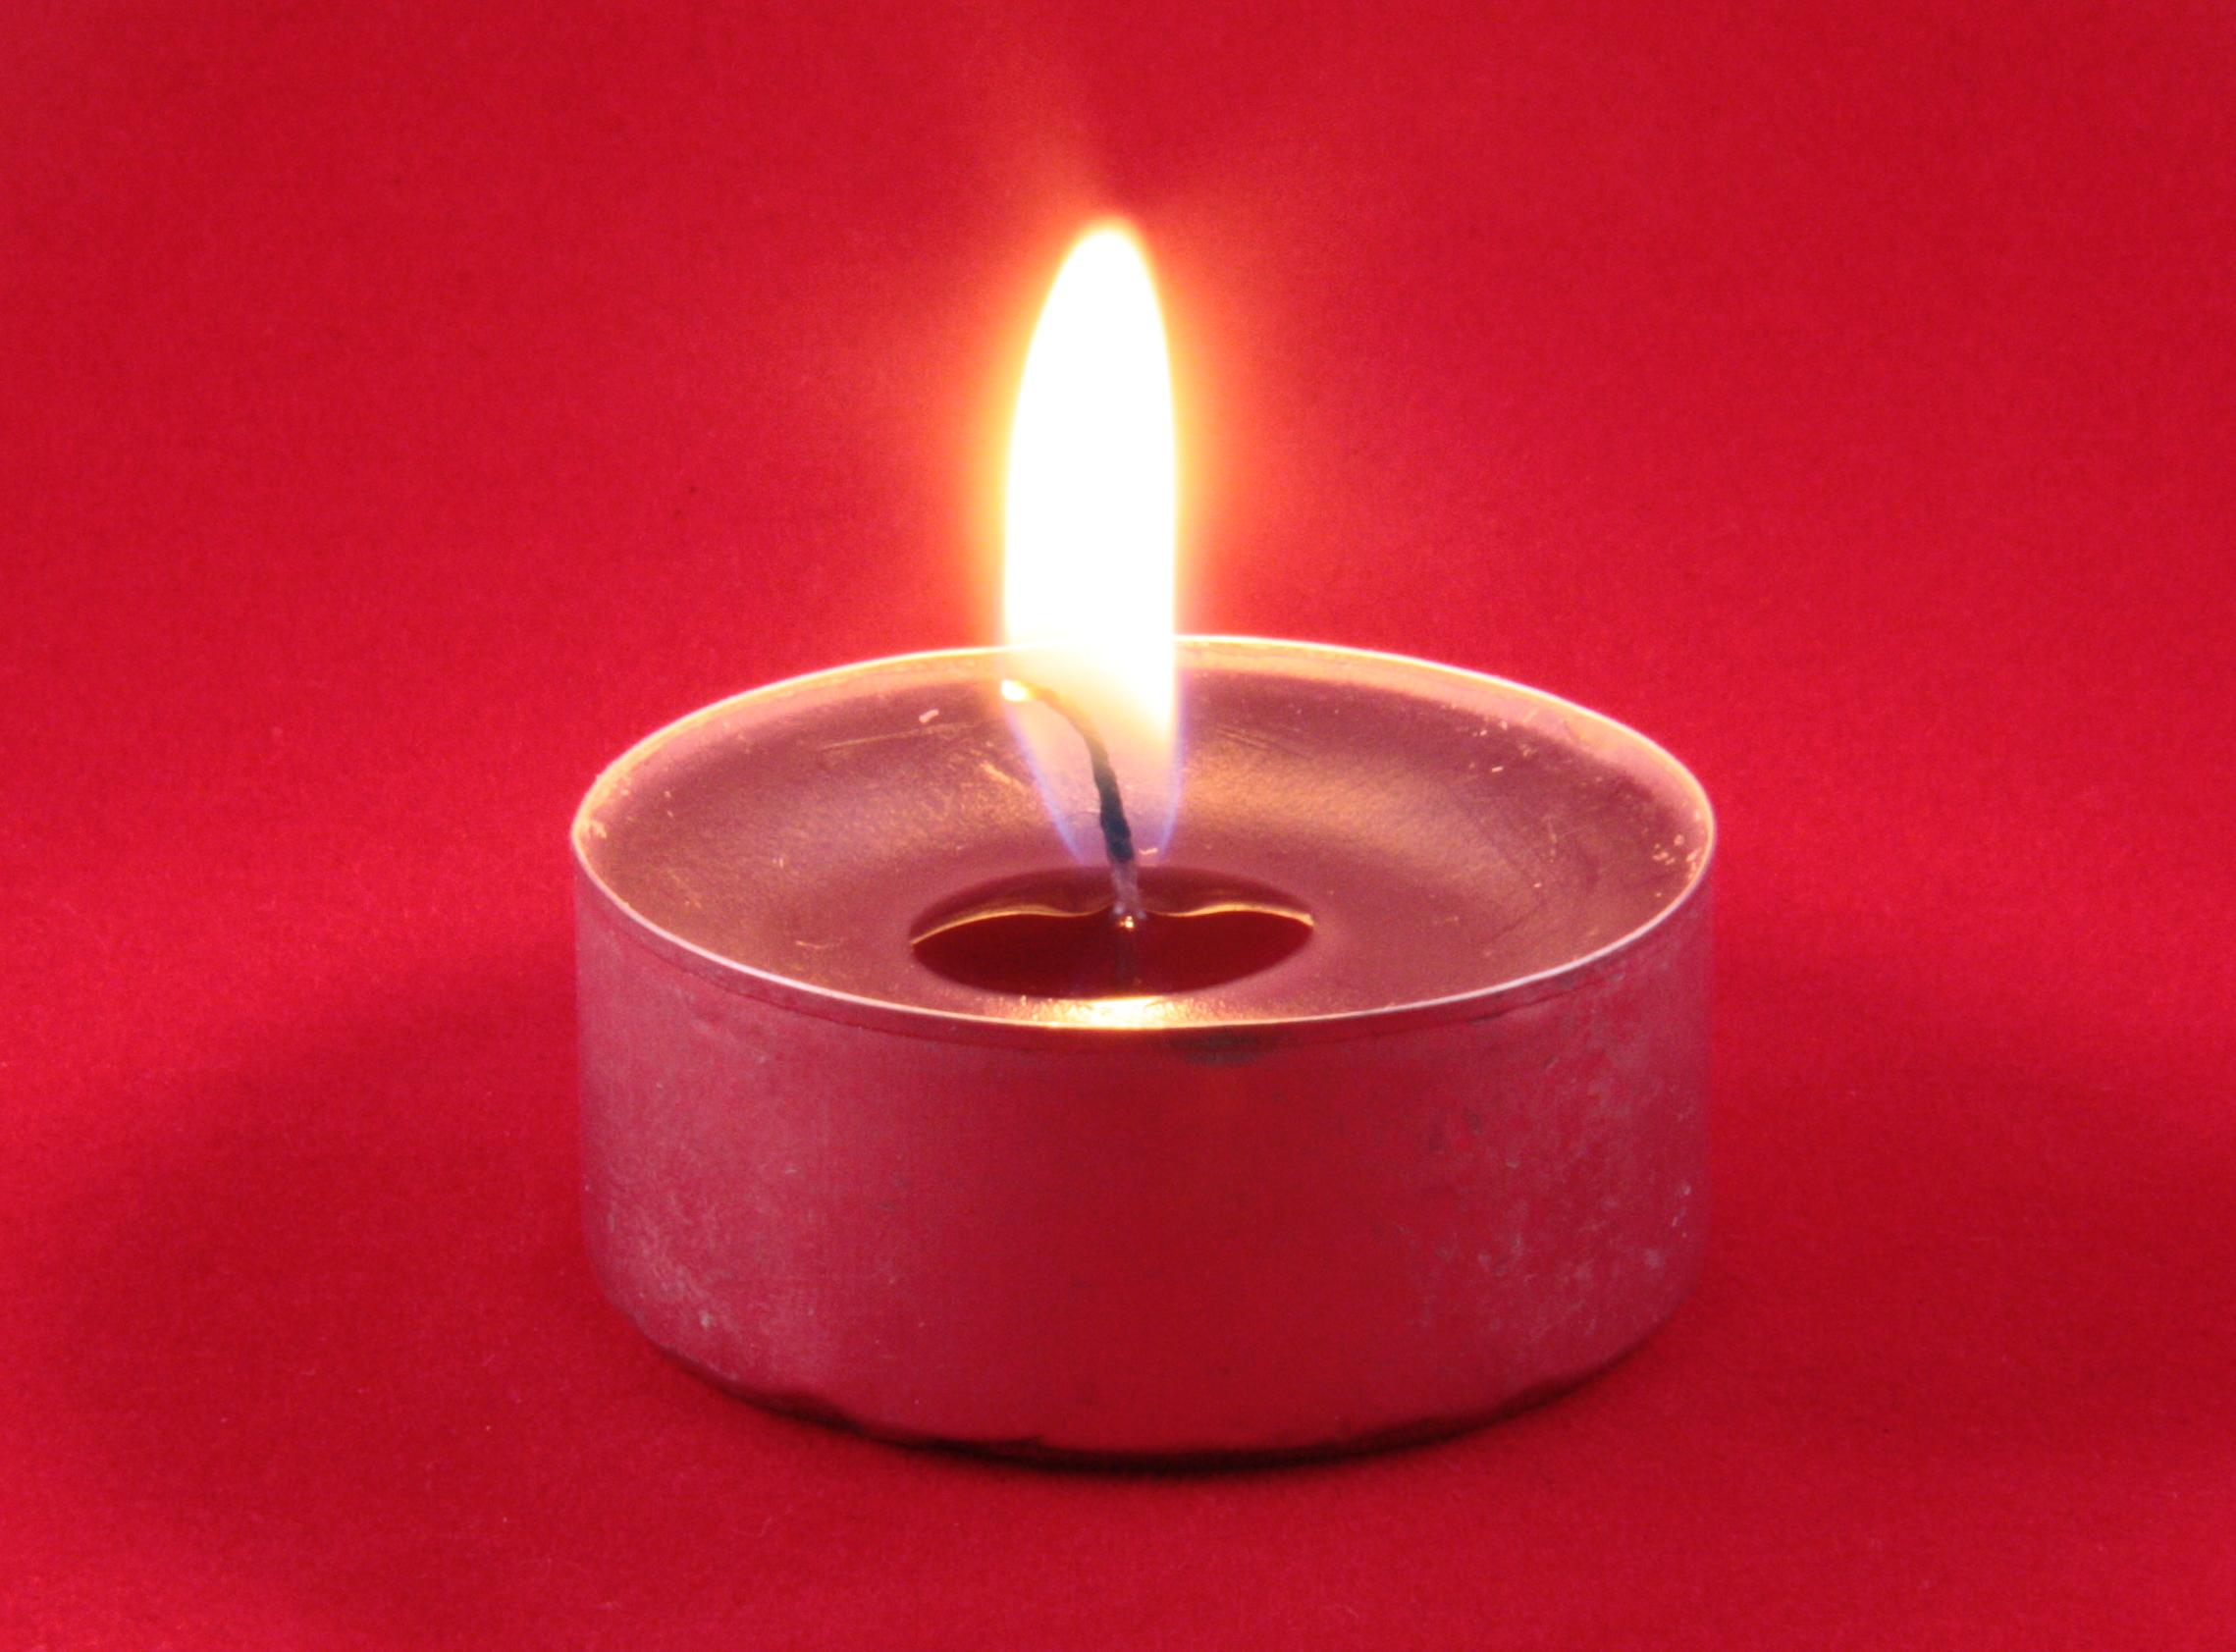 Tealight - Wikipedia